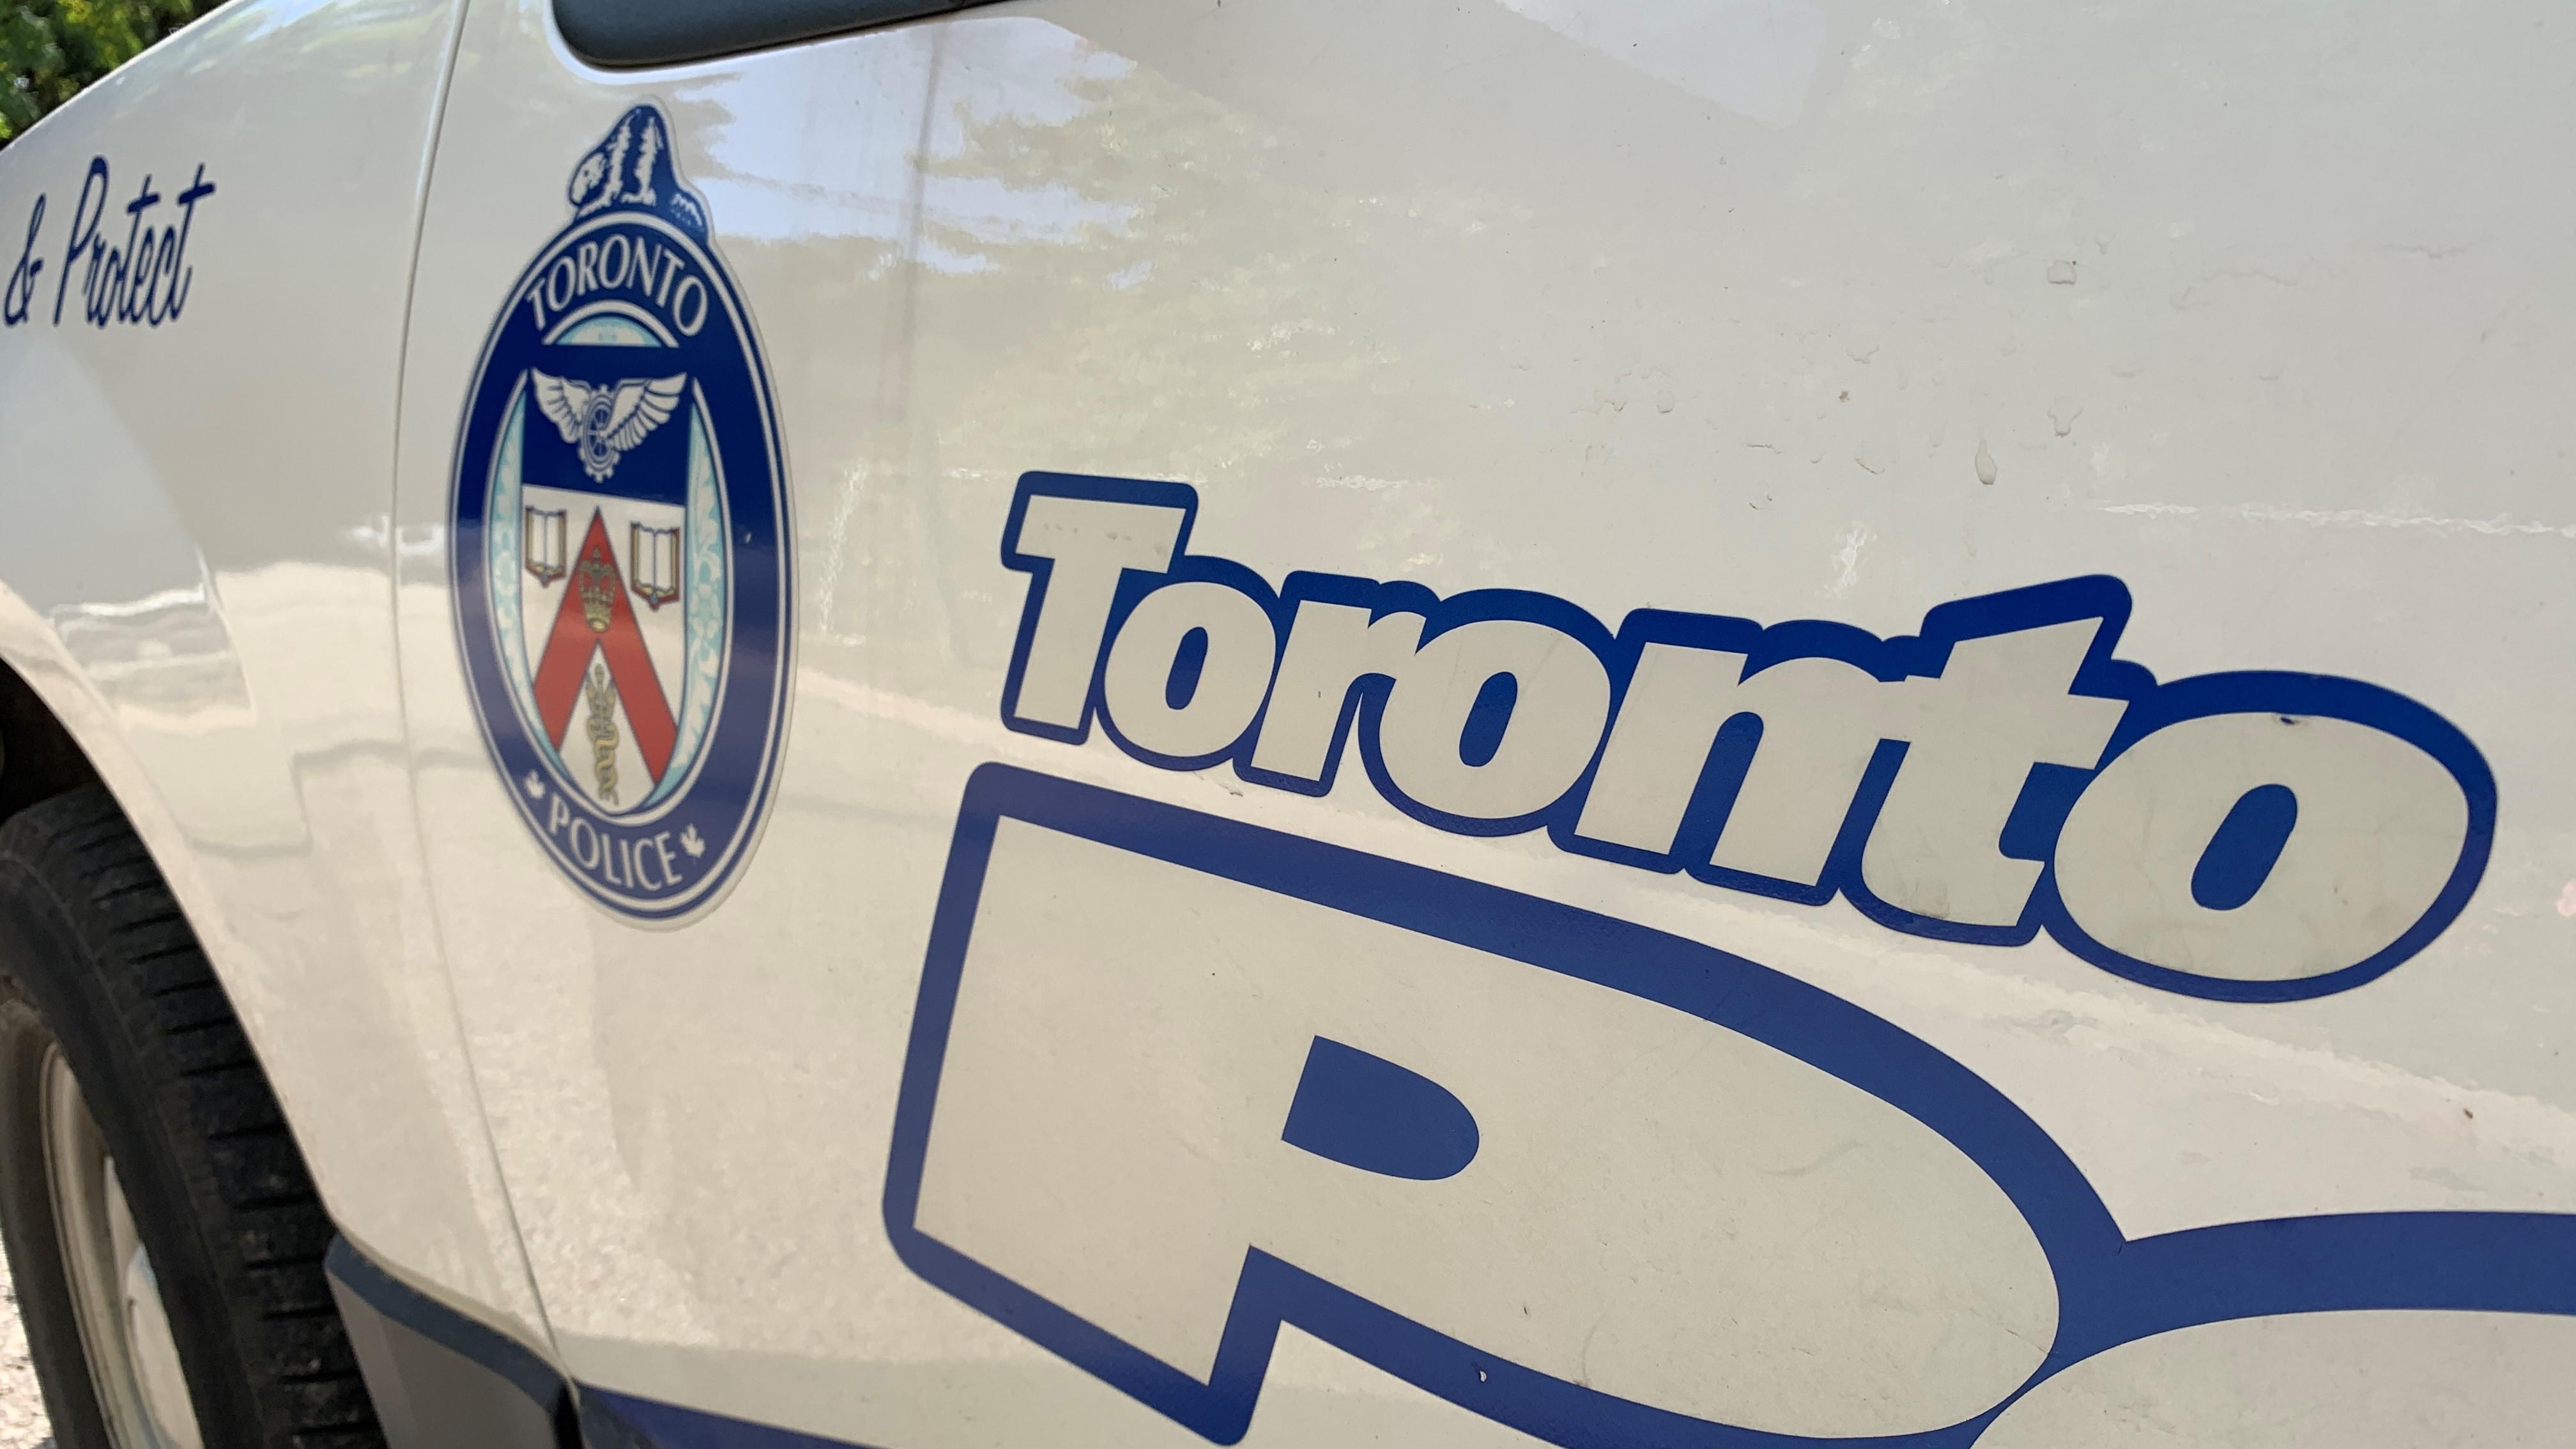 Man arrested for series of break-ins, sexual assault in Etobicoke